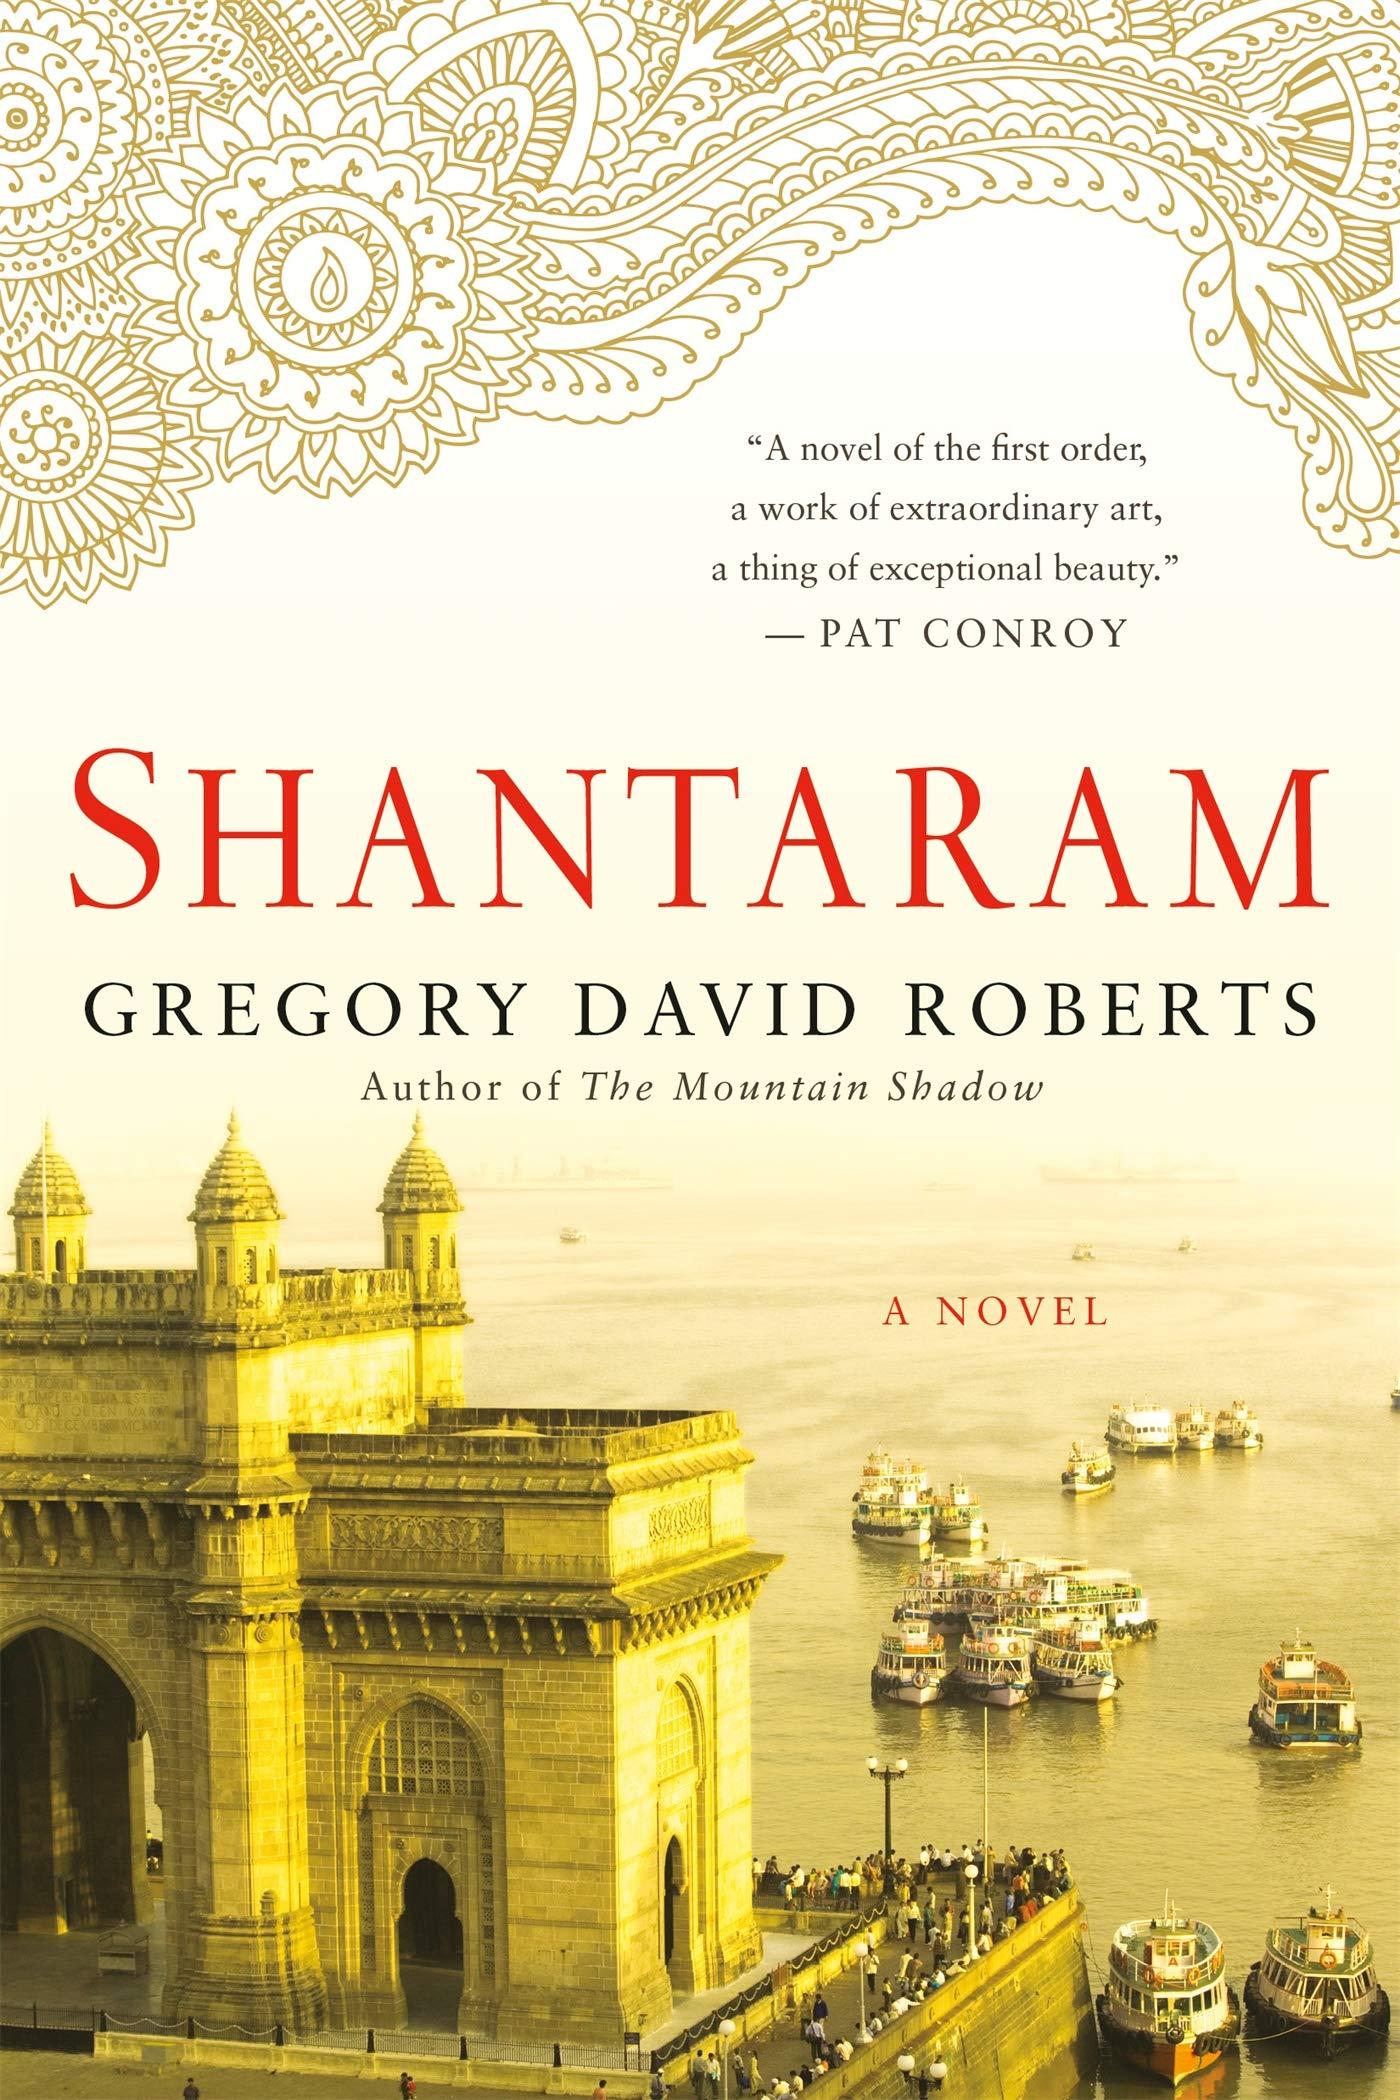 Best Travel Books: Shantaram by Gregory David Roberts